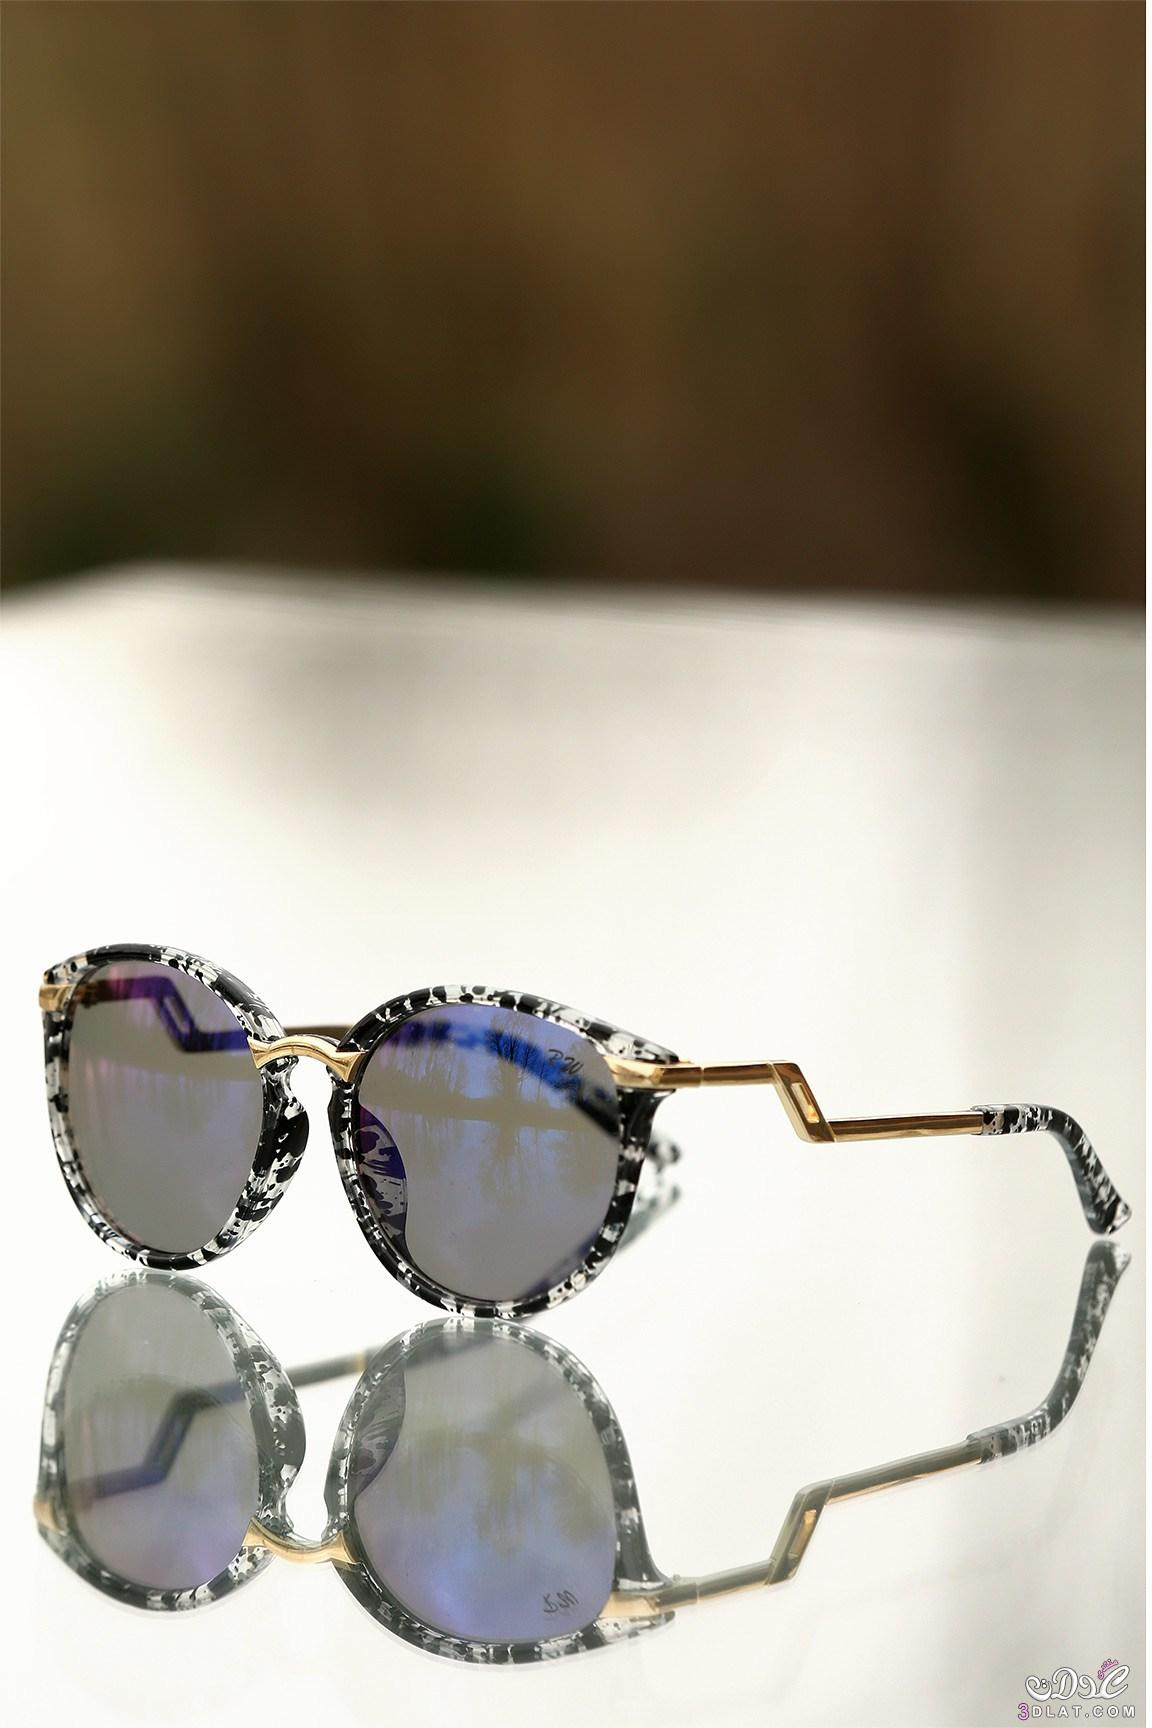 37543f378 نظارات شمسية حريمي 2020 .... كولكشن نظارات شمسية 2020...نظارات حريمي ...